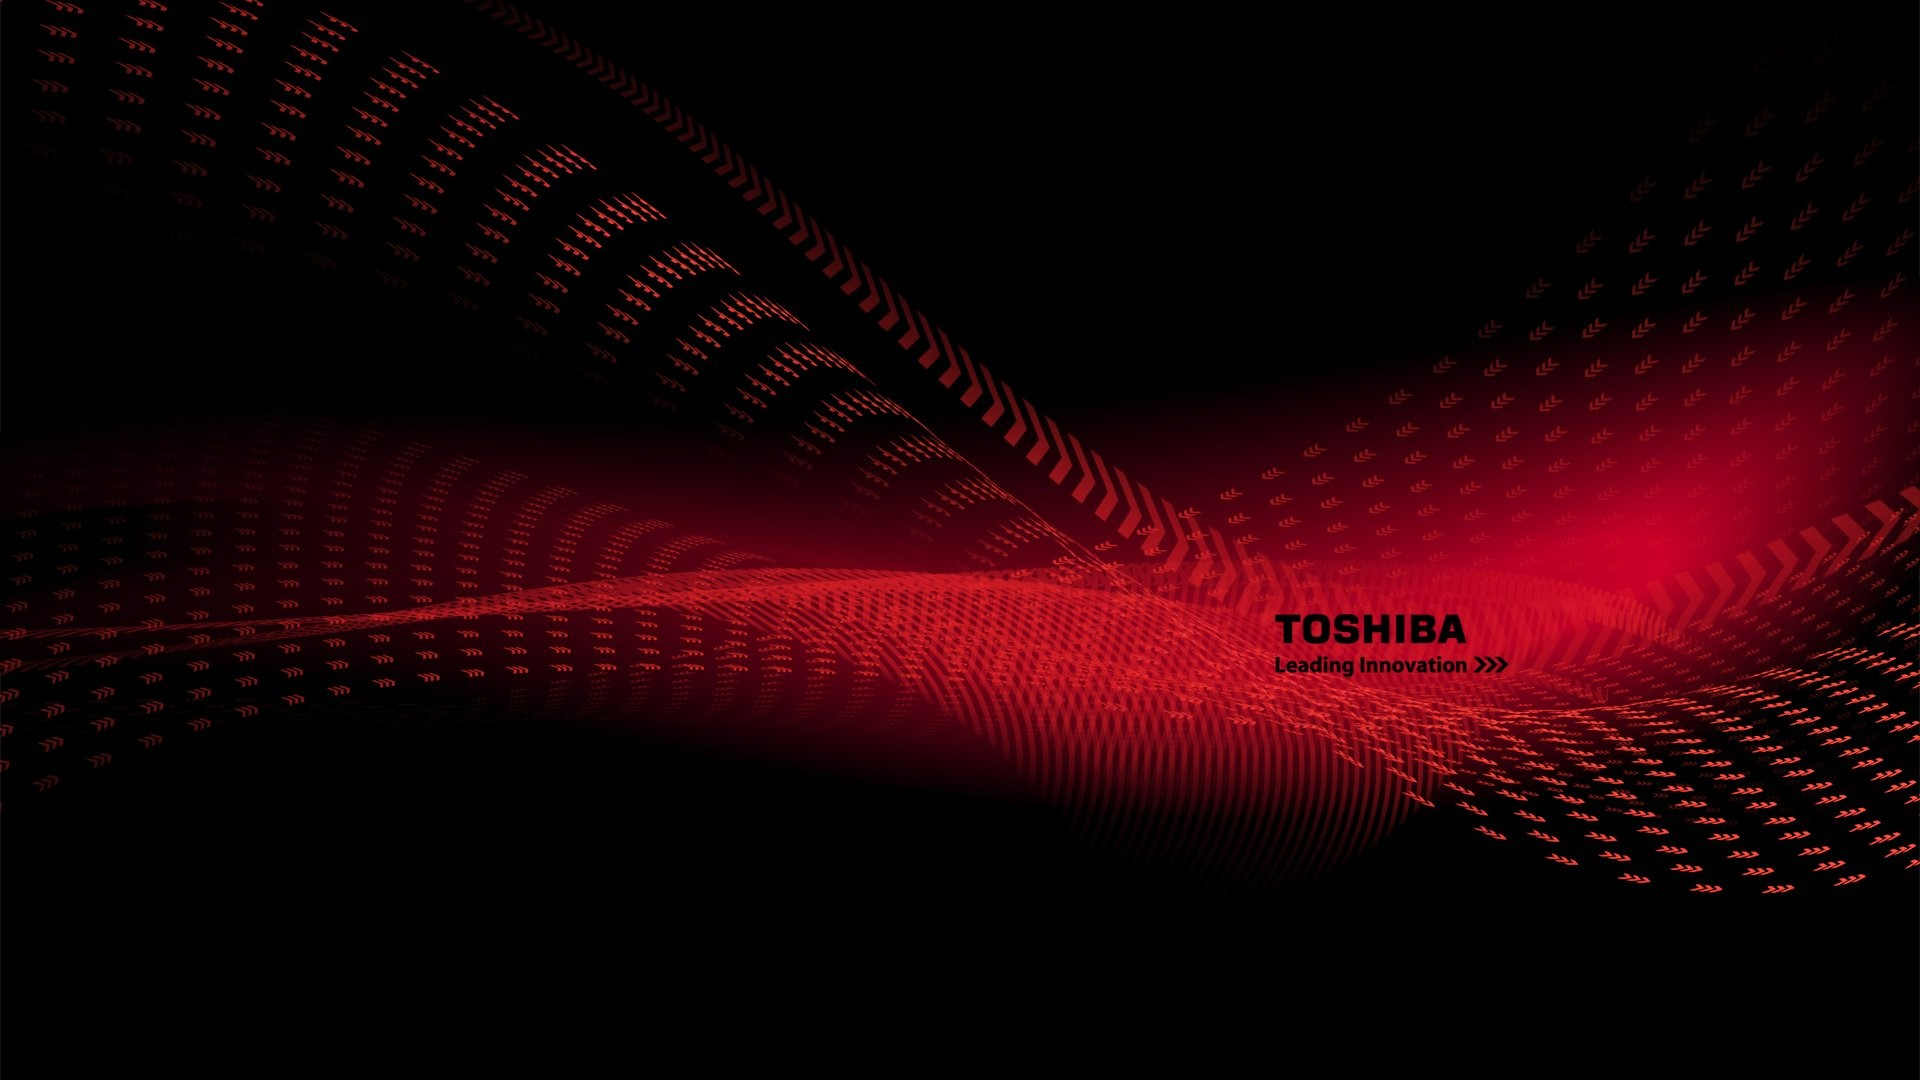 Toshiba Red